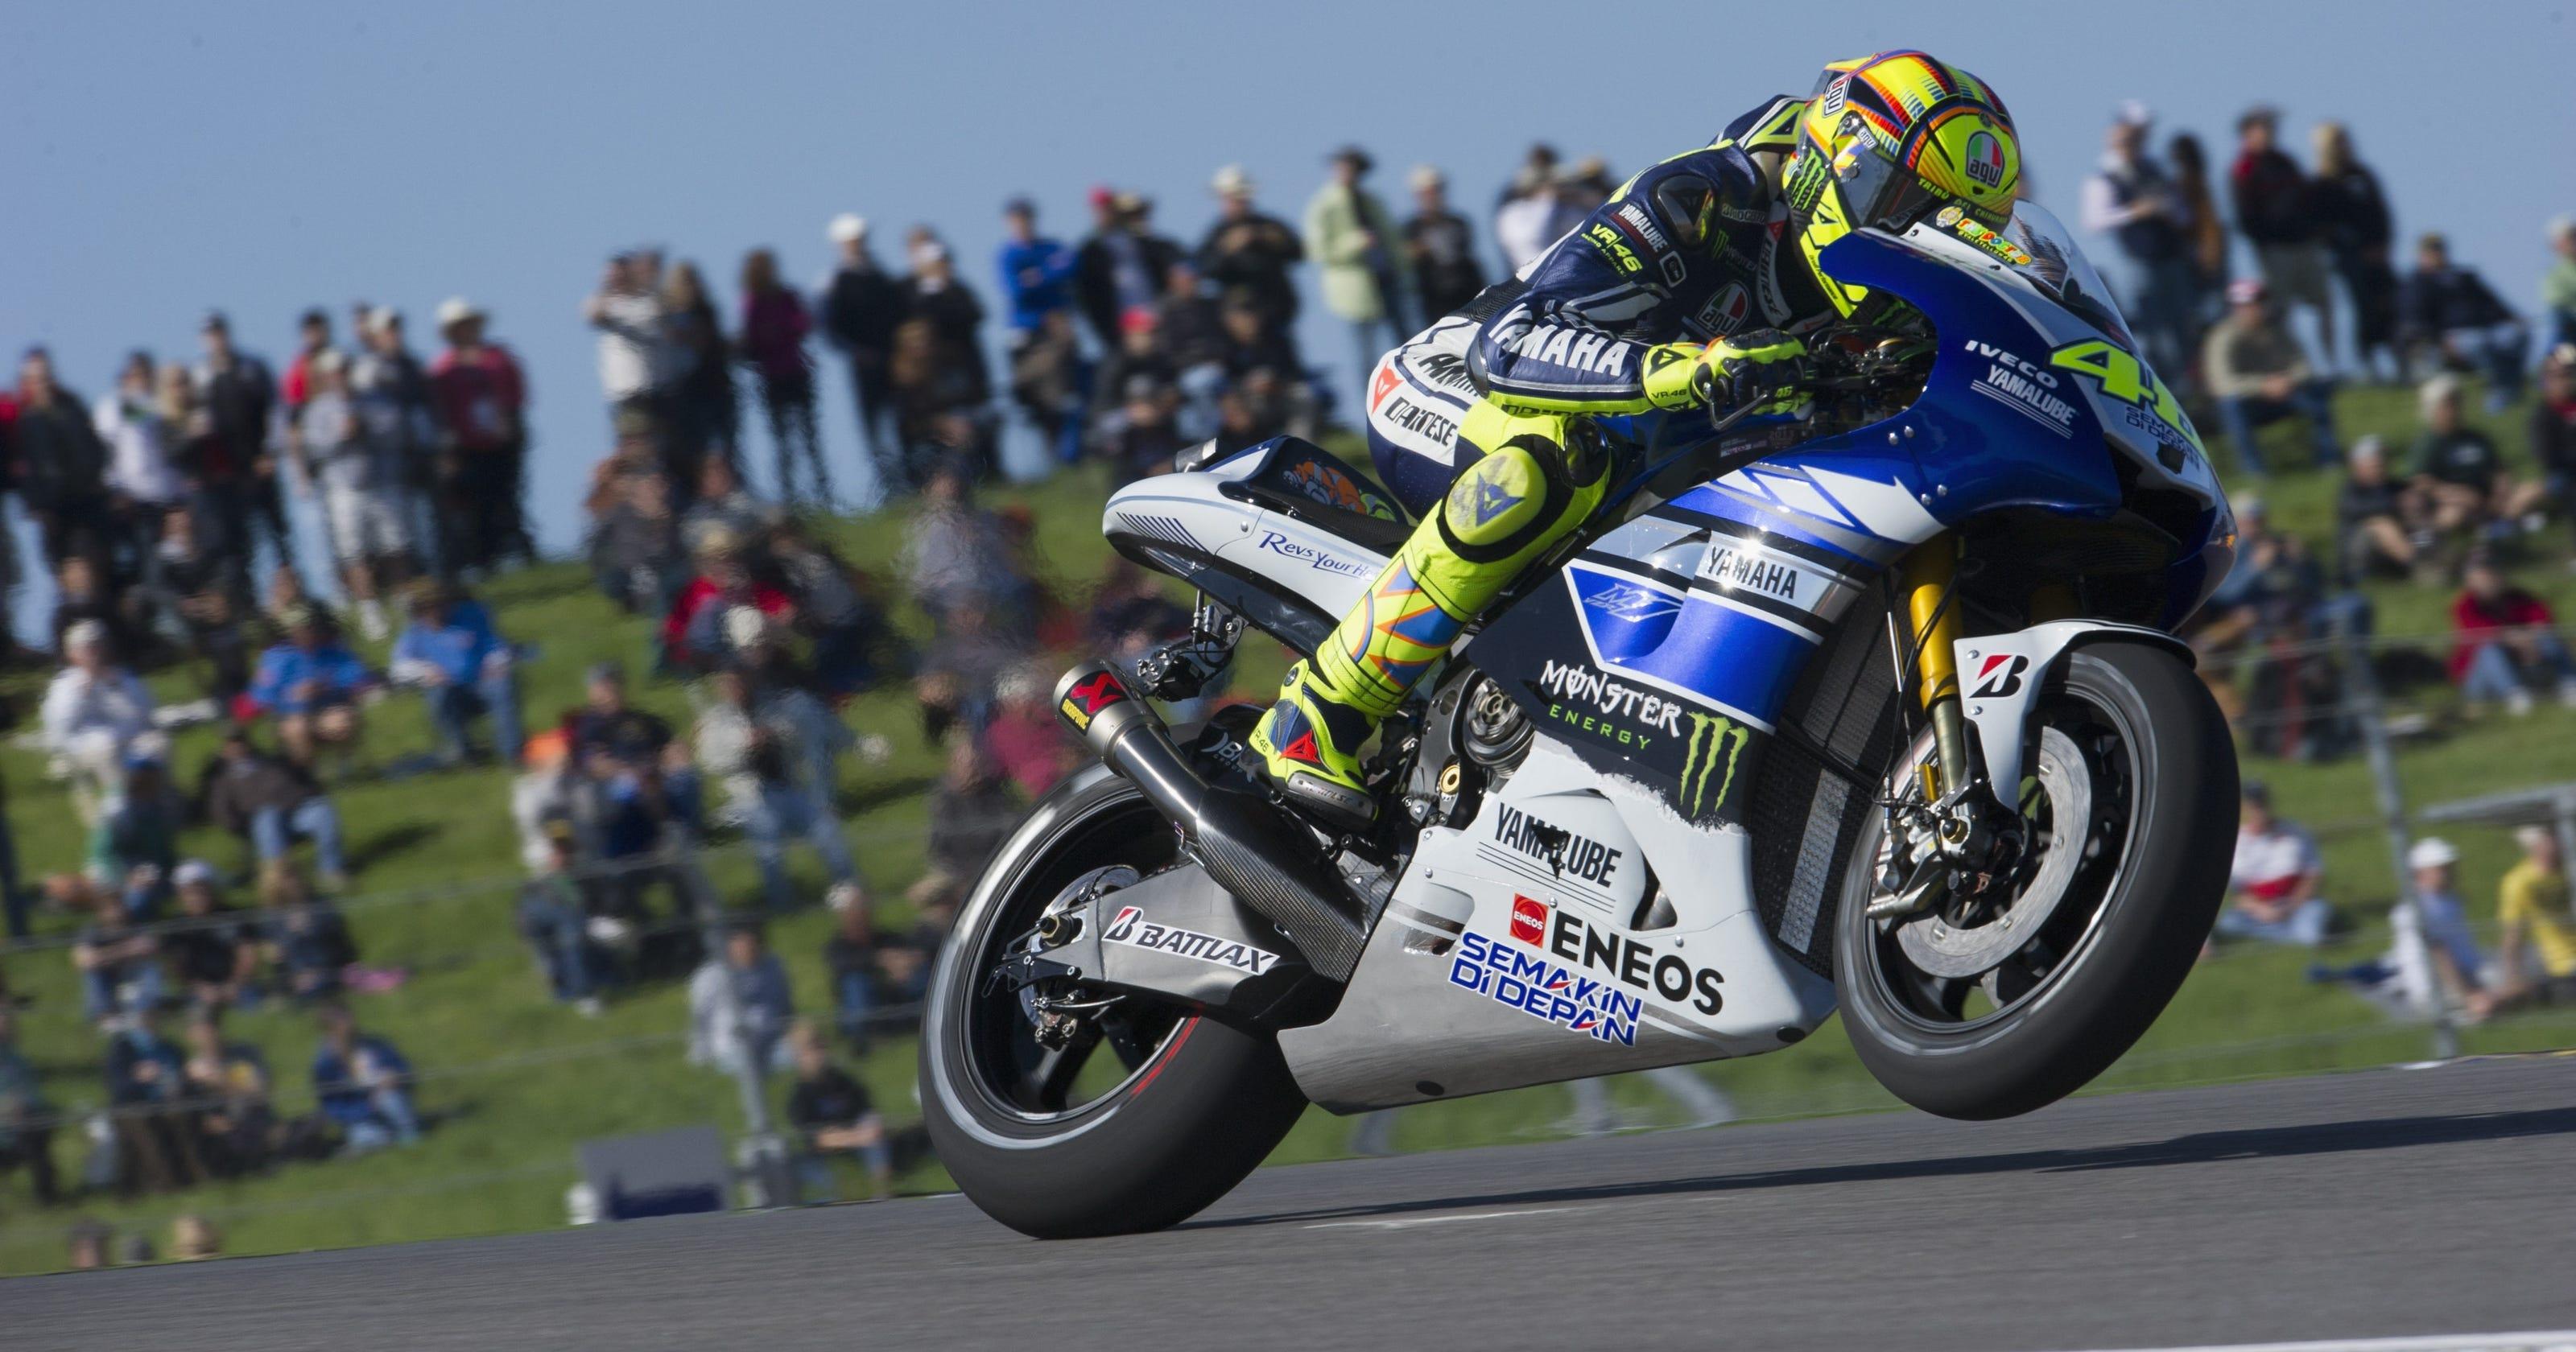 Motorcycle racing series MotoGP expands to Austin